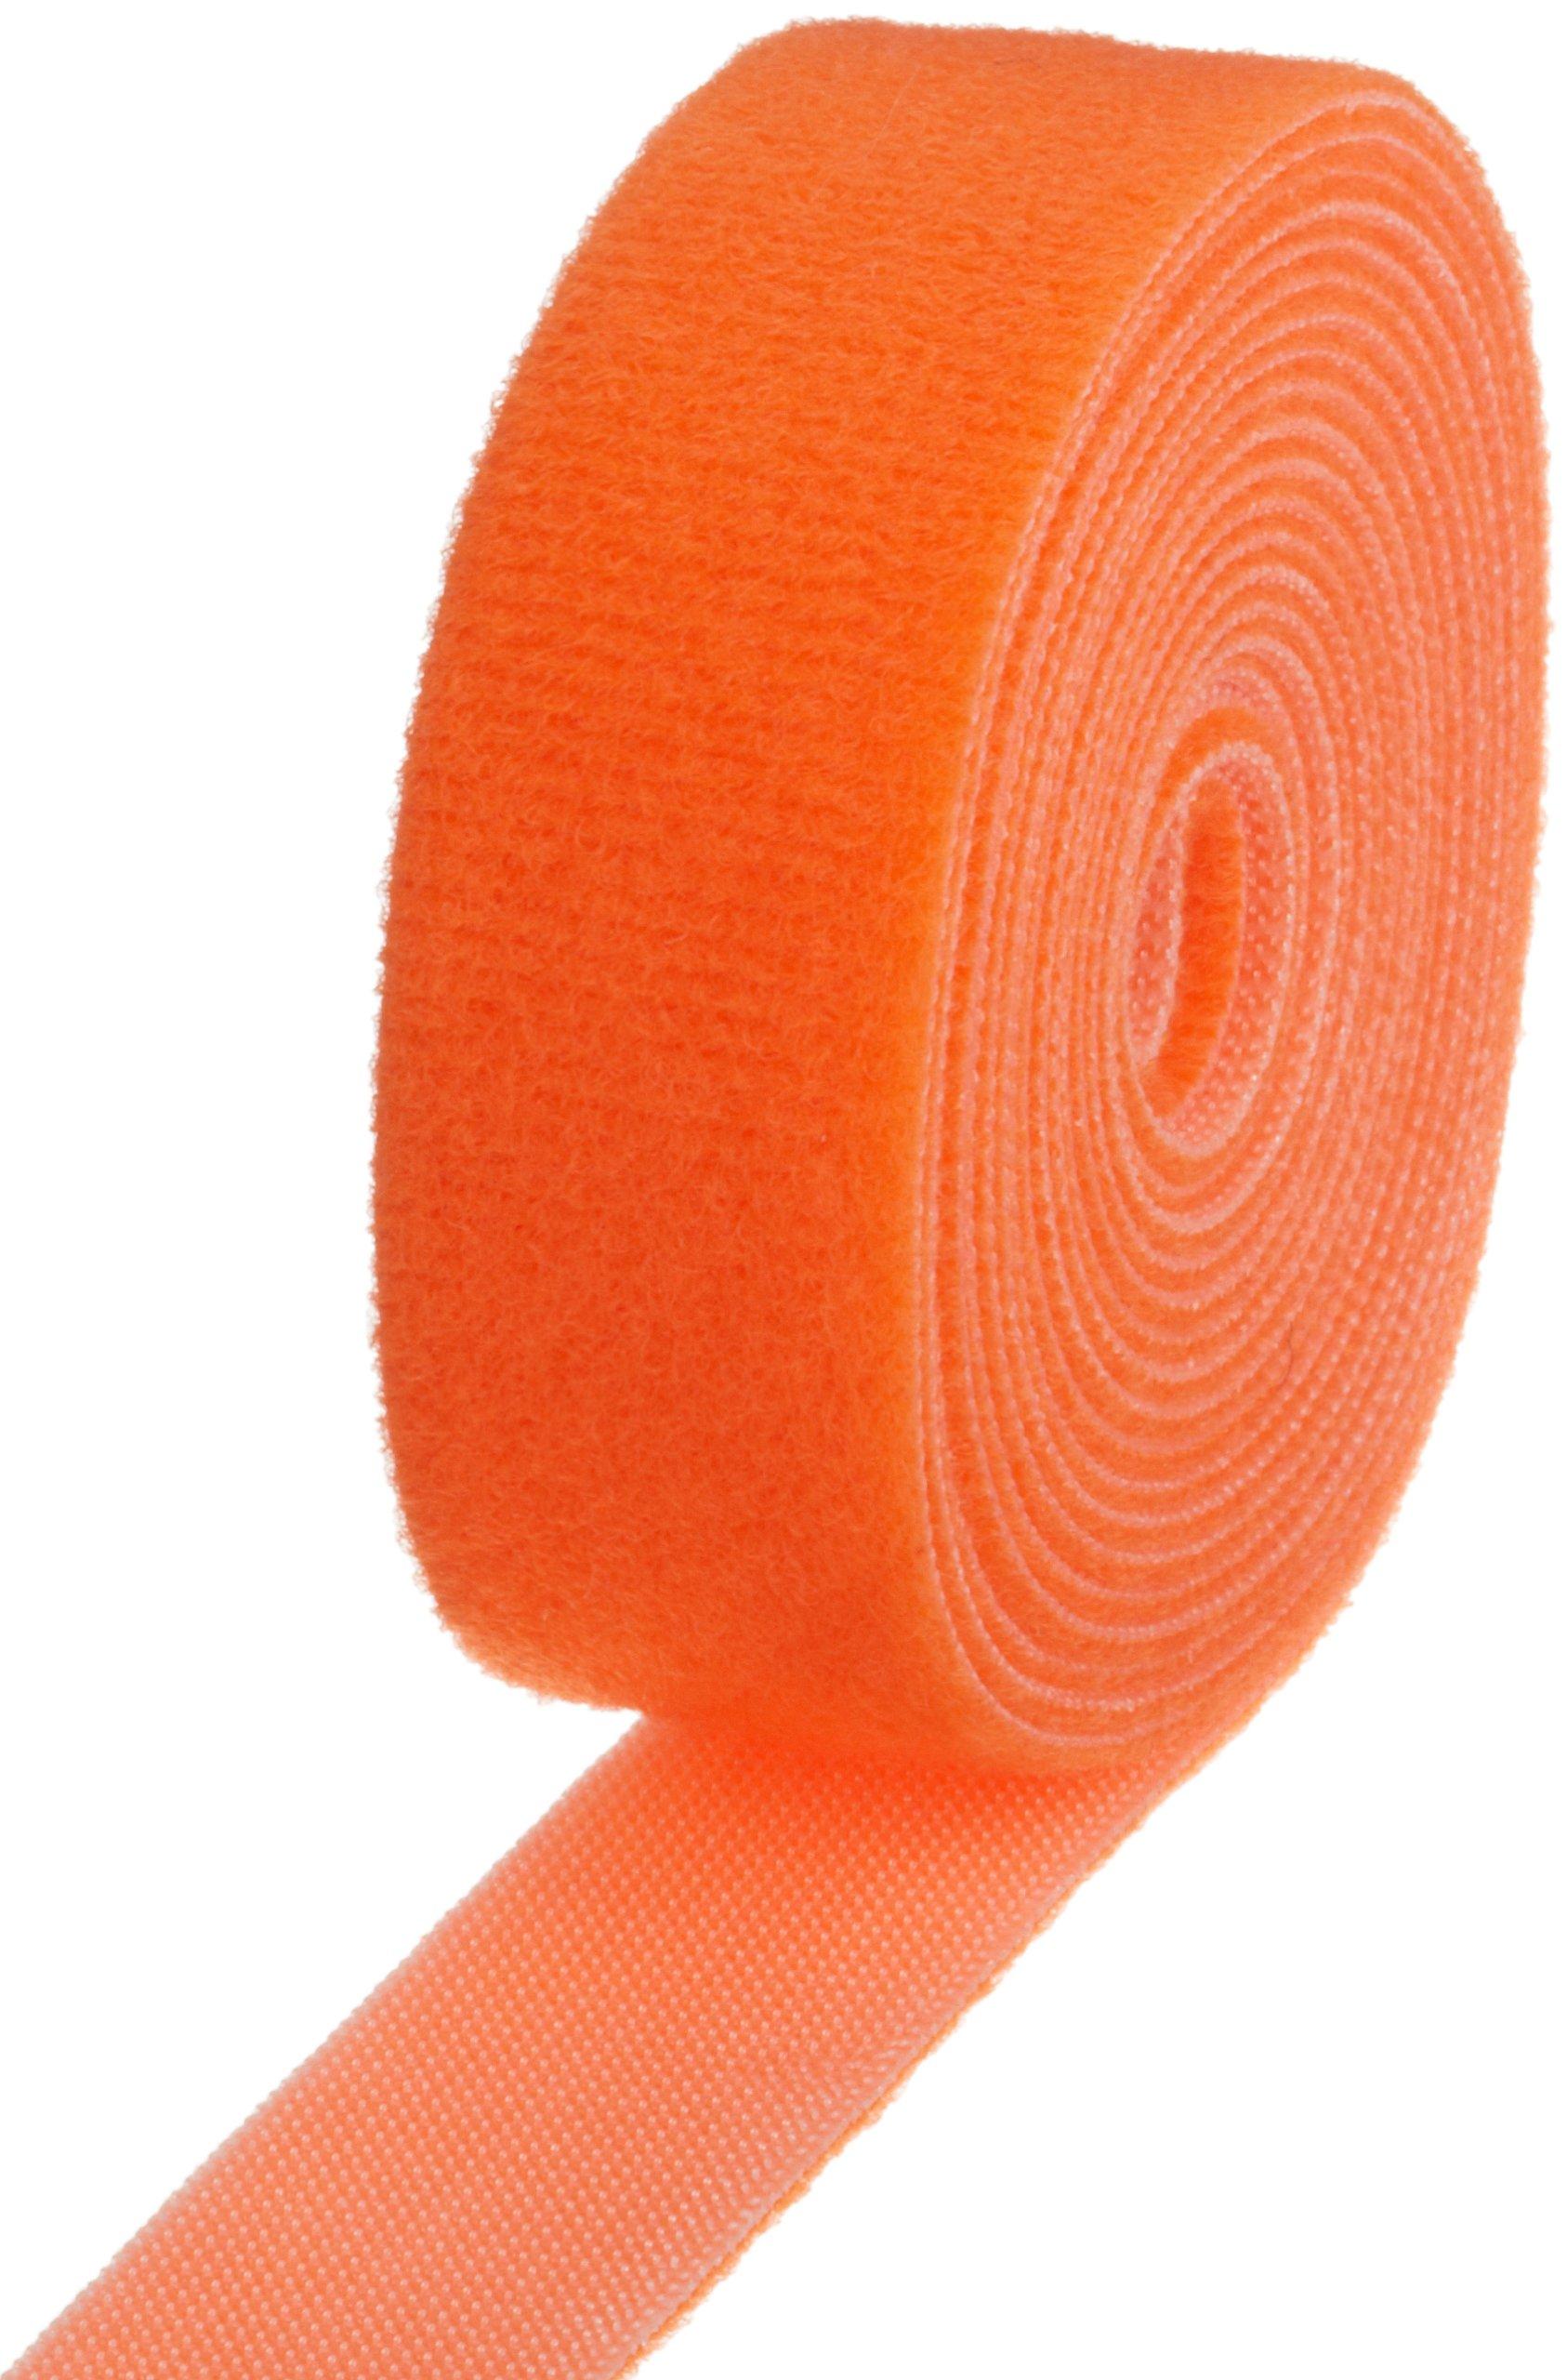 VELCRO 1834-OW-PB/B Orange Nylon Velcro Onewrap Strap, Hook and Loop, 1'' Wide, 10' Length